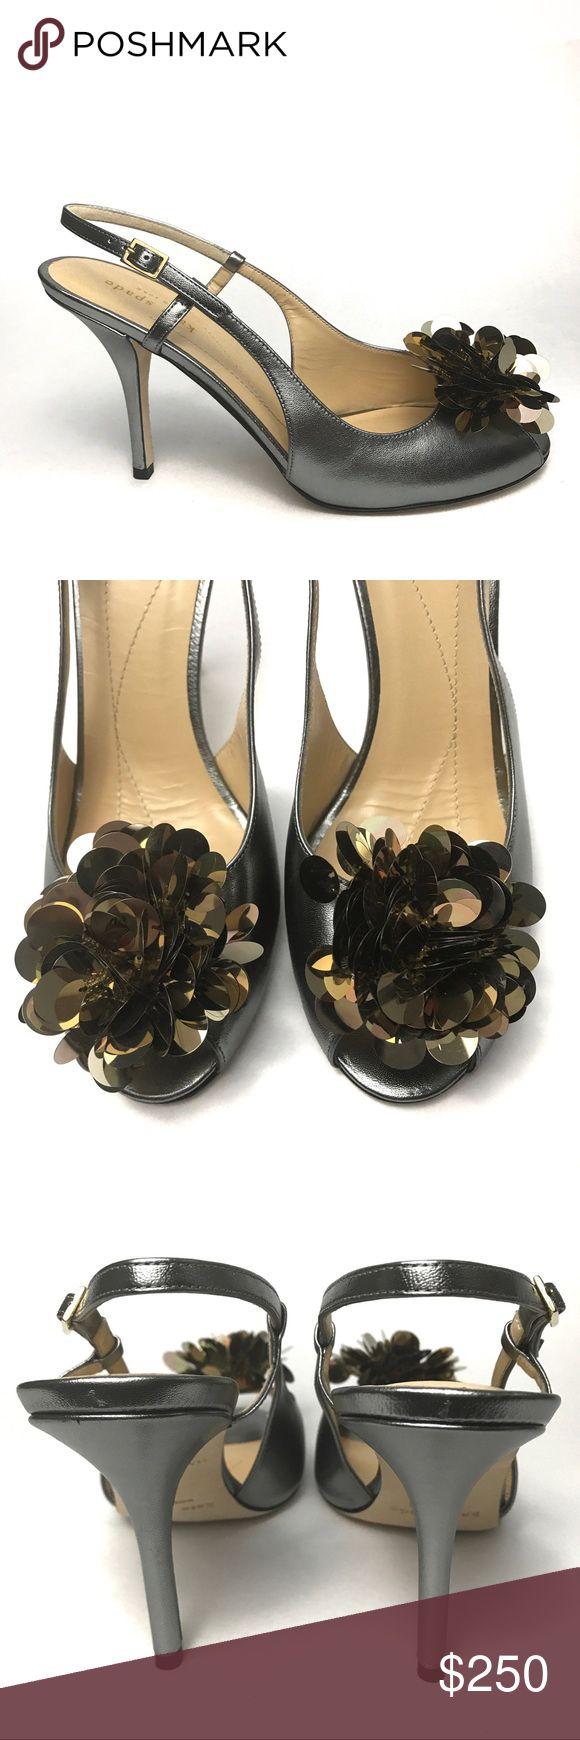 "Kate Spade Pom Pom Sequin Caz Slingback Heels Brand new slingback heels! Silver leather, gold paillette sequins. Adjustable buckle, open toe. Approximately 3.5"" heel. kate spade Shoes Heels"